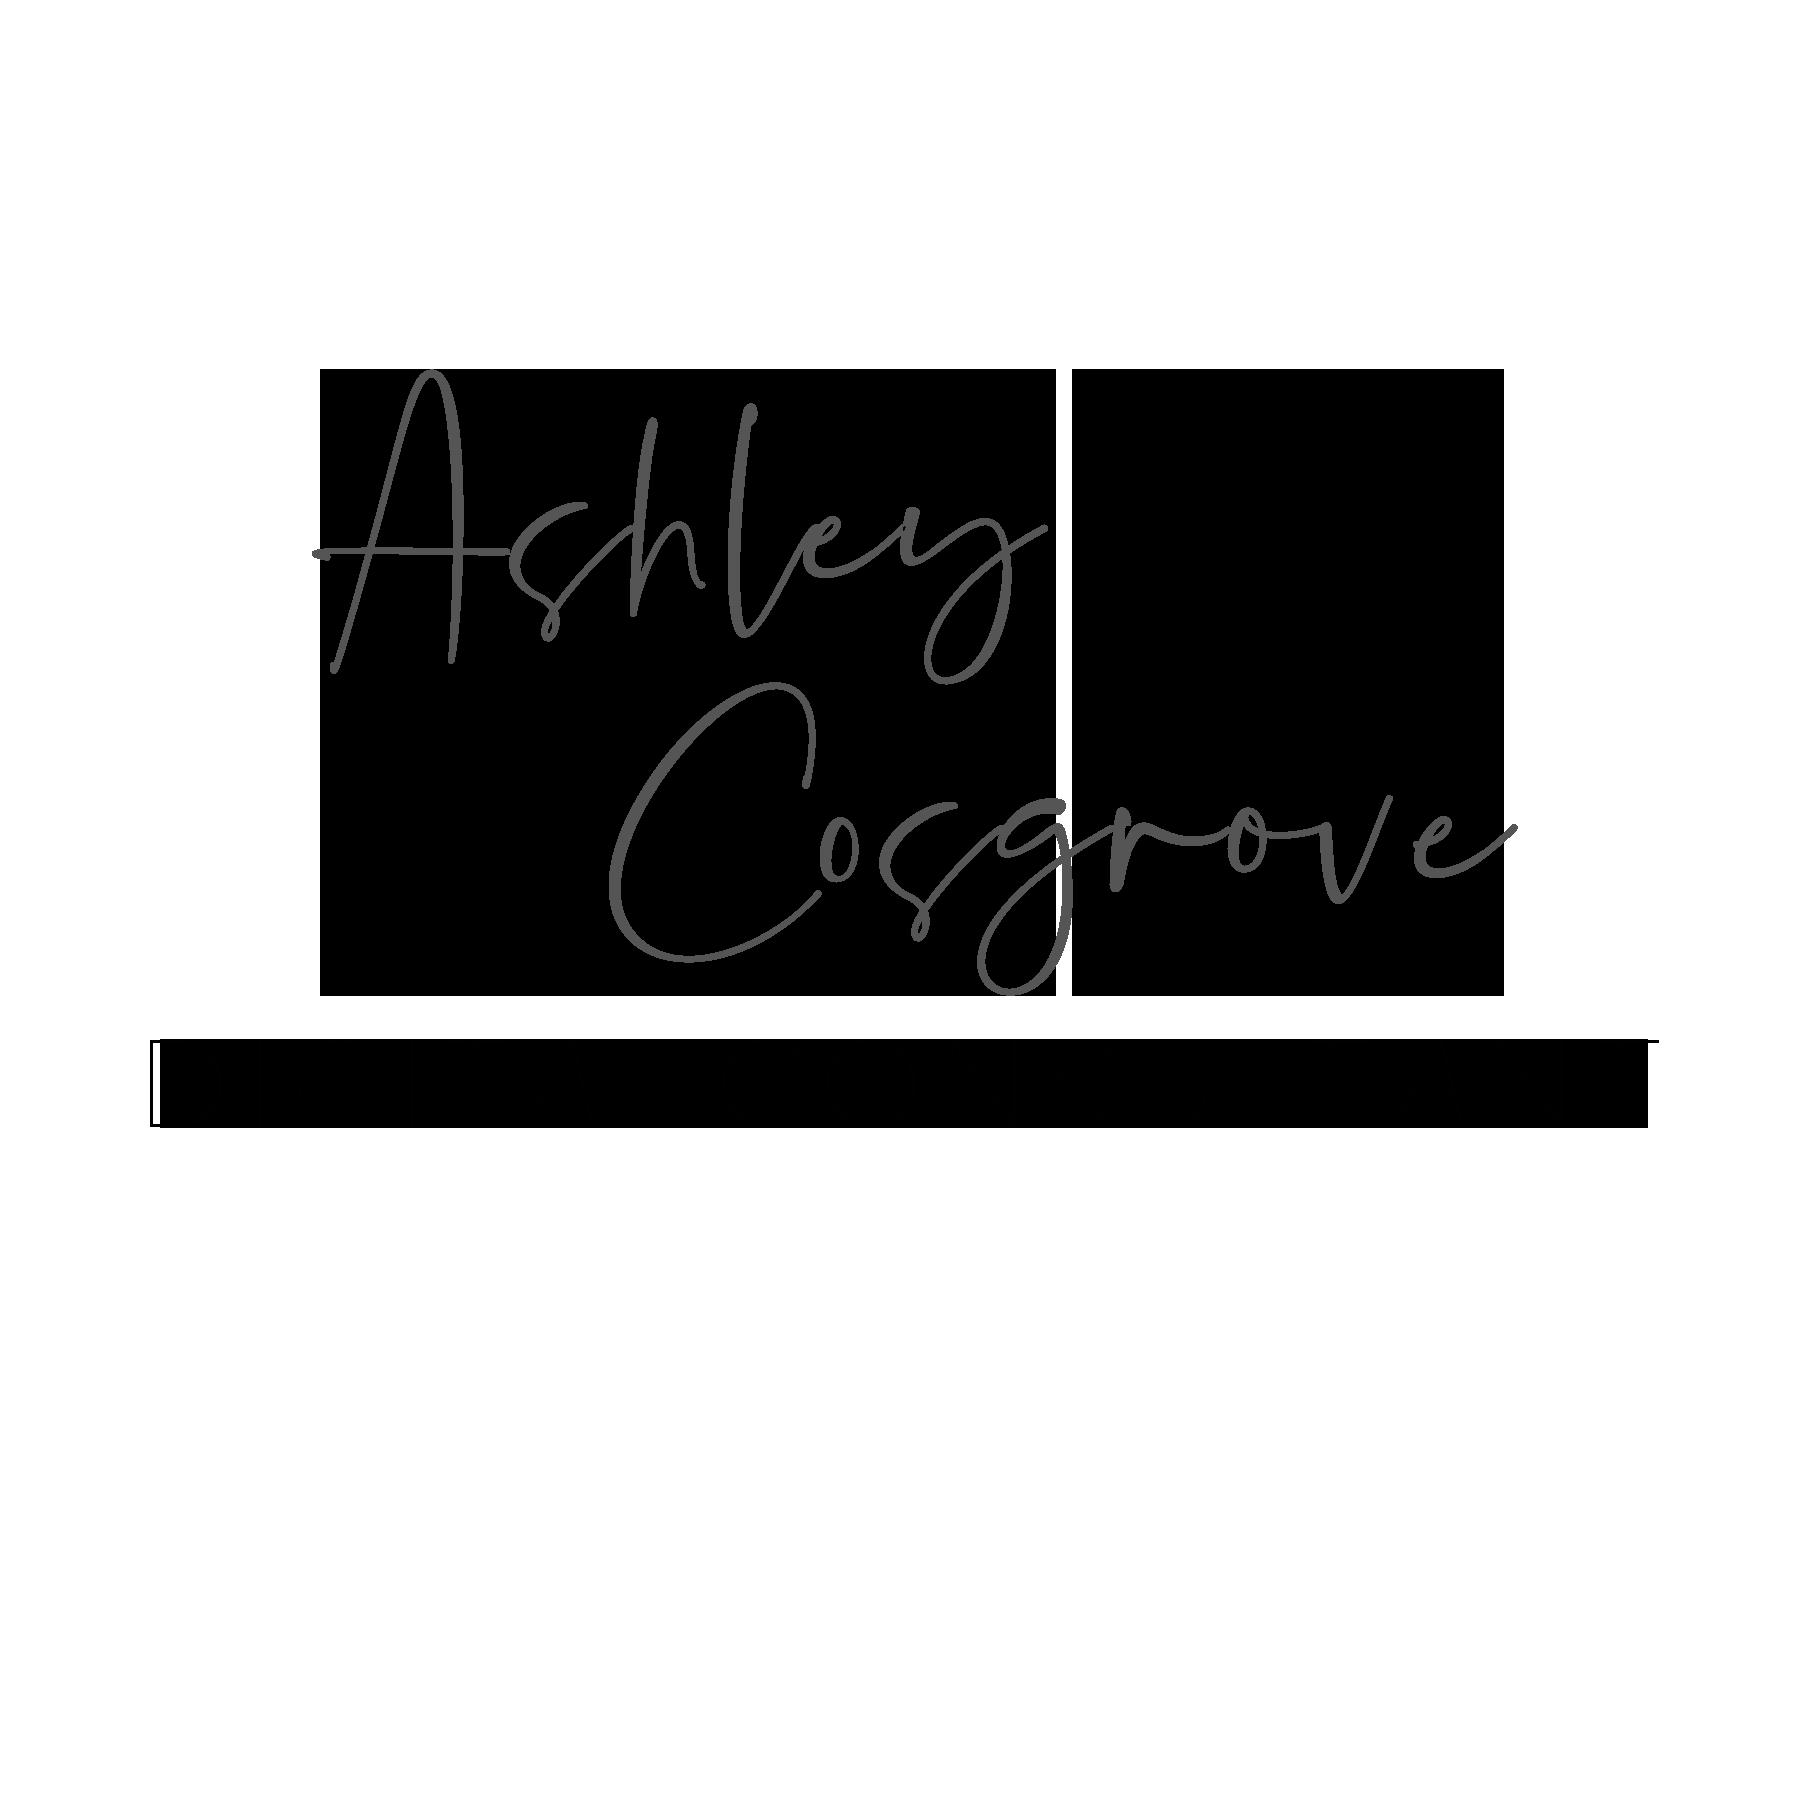 Ashley Cosgrove